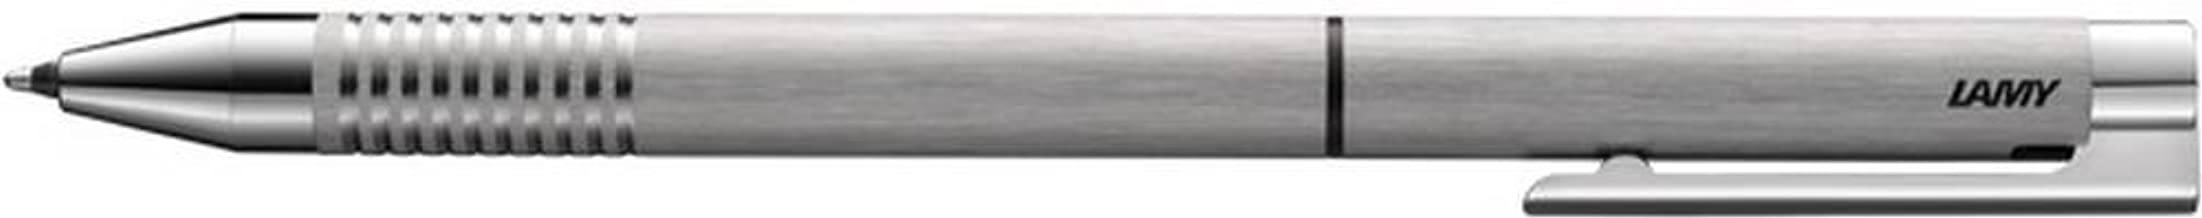 Lamy Unisex Logo Brushed Stainless Steel Twin Multisystem Pen - Silver